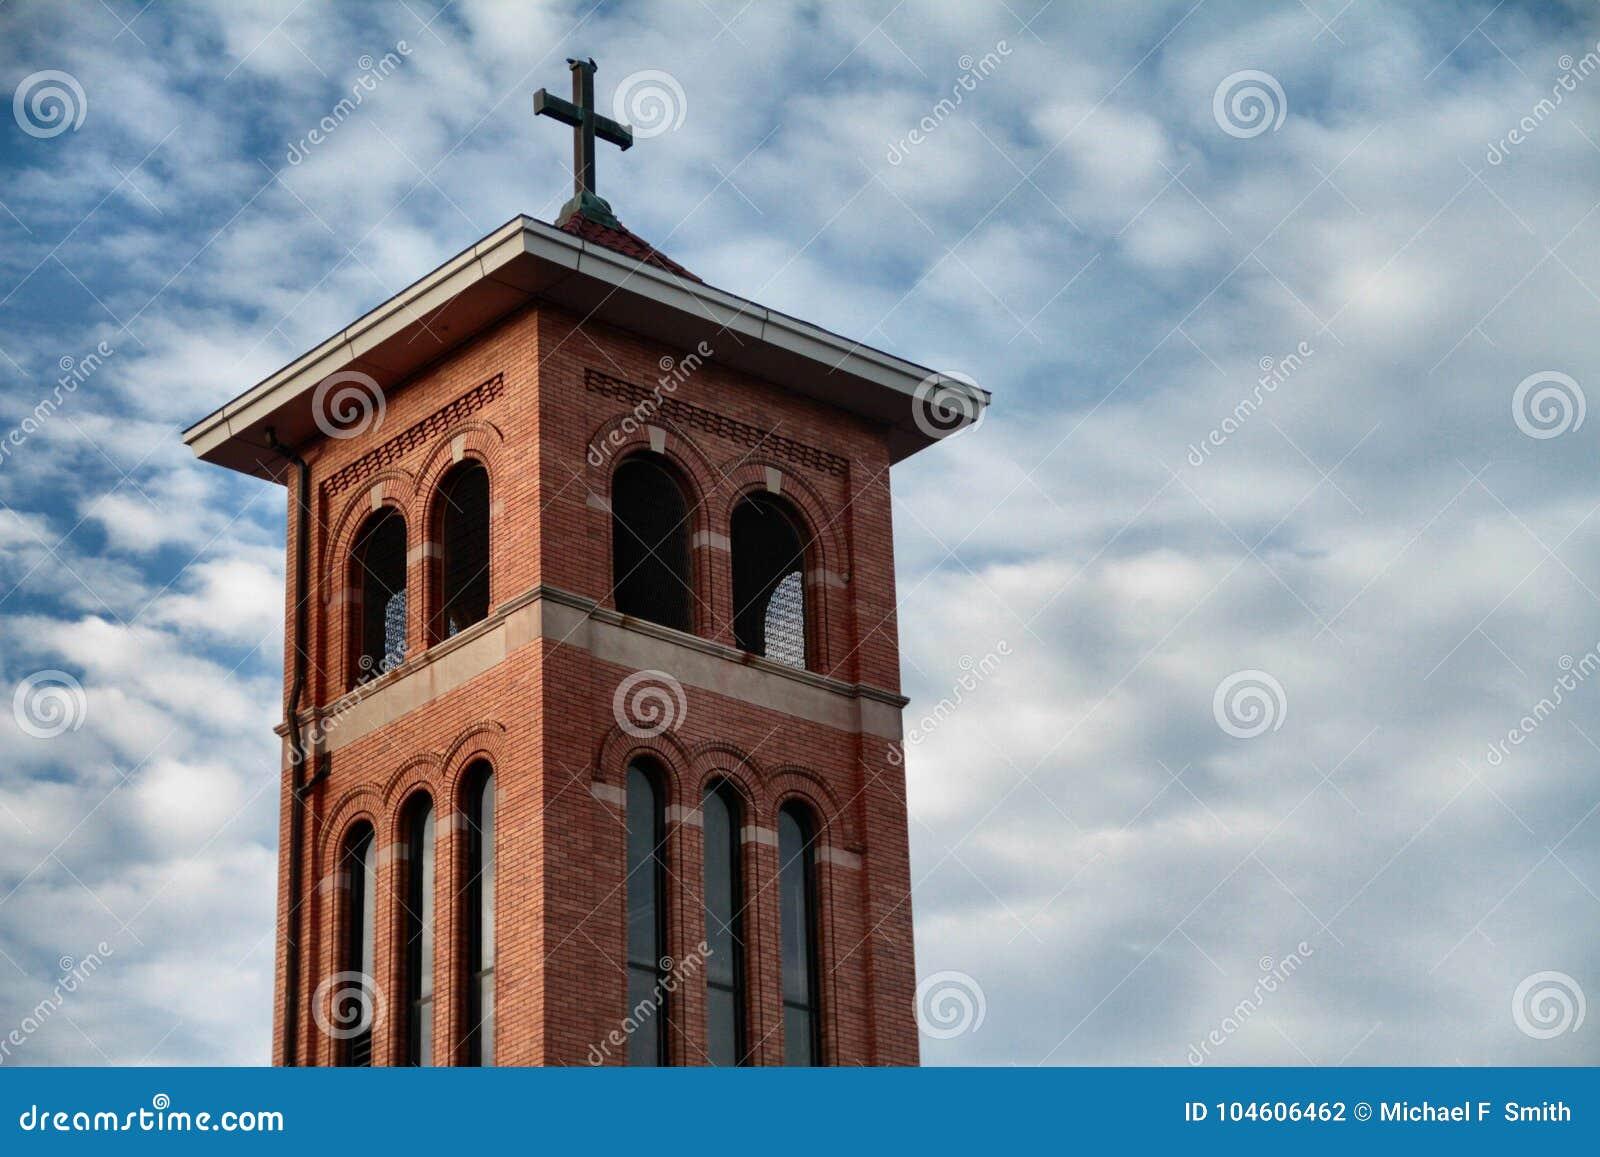 Symbool van godsdienst